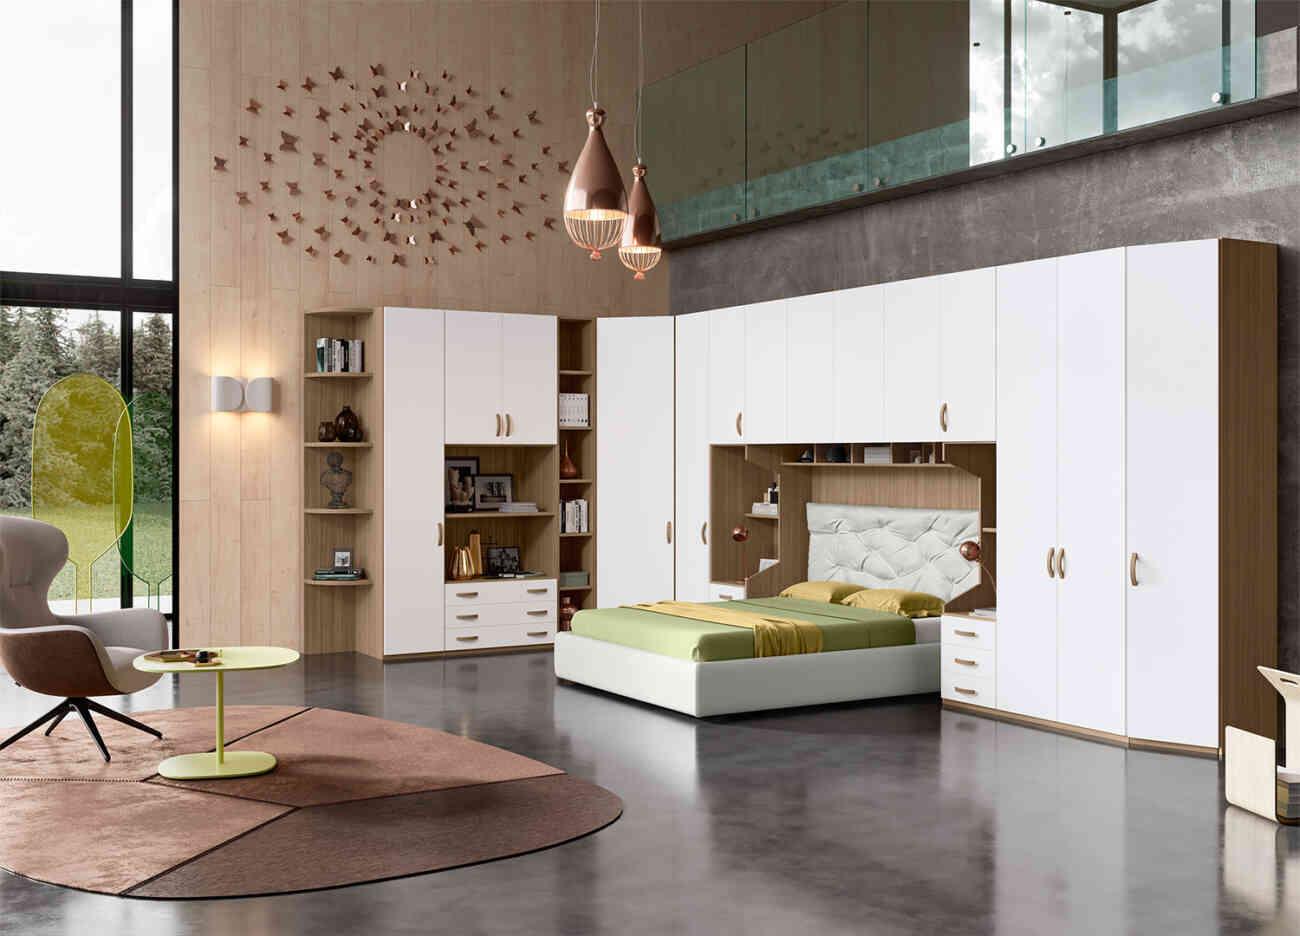 Camera da letto CM272 - Giessegi - Gruppo Inventa ...